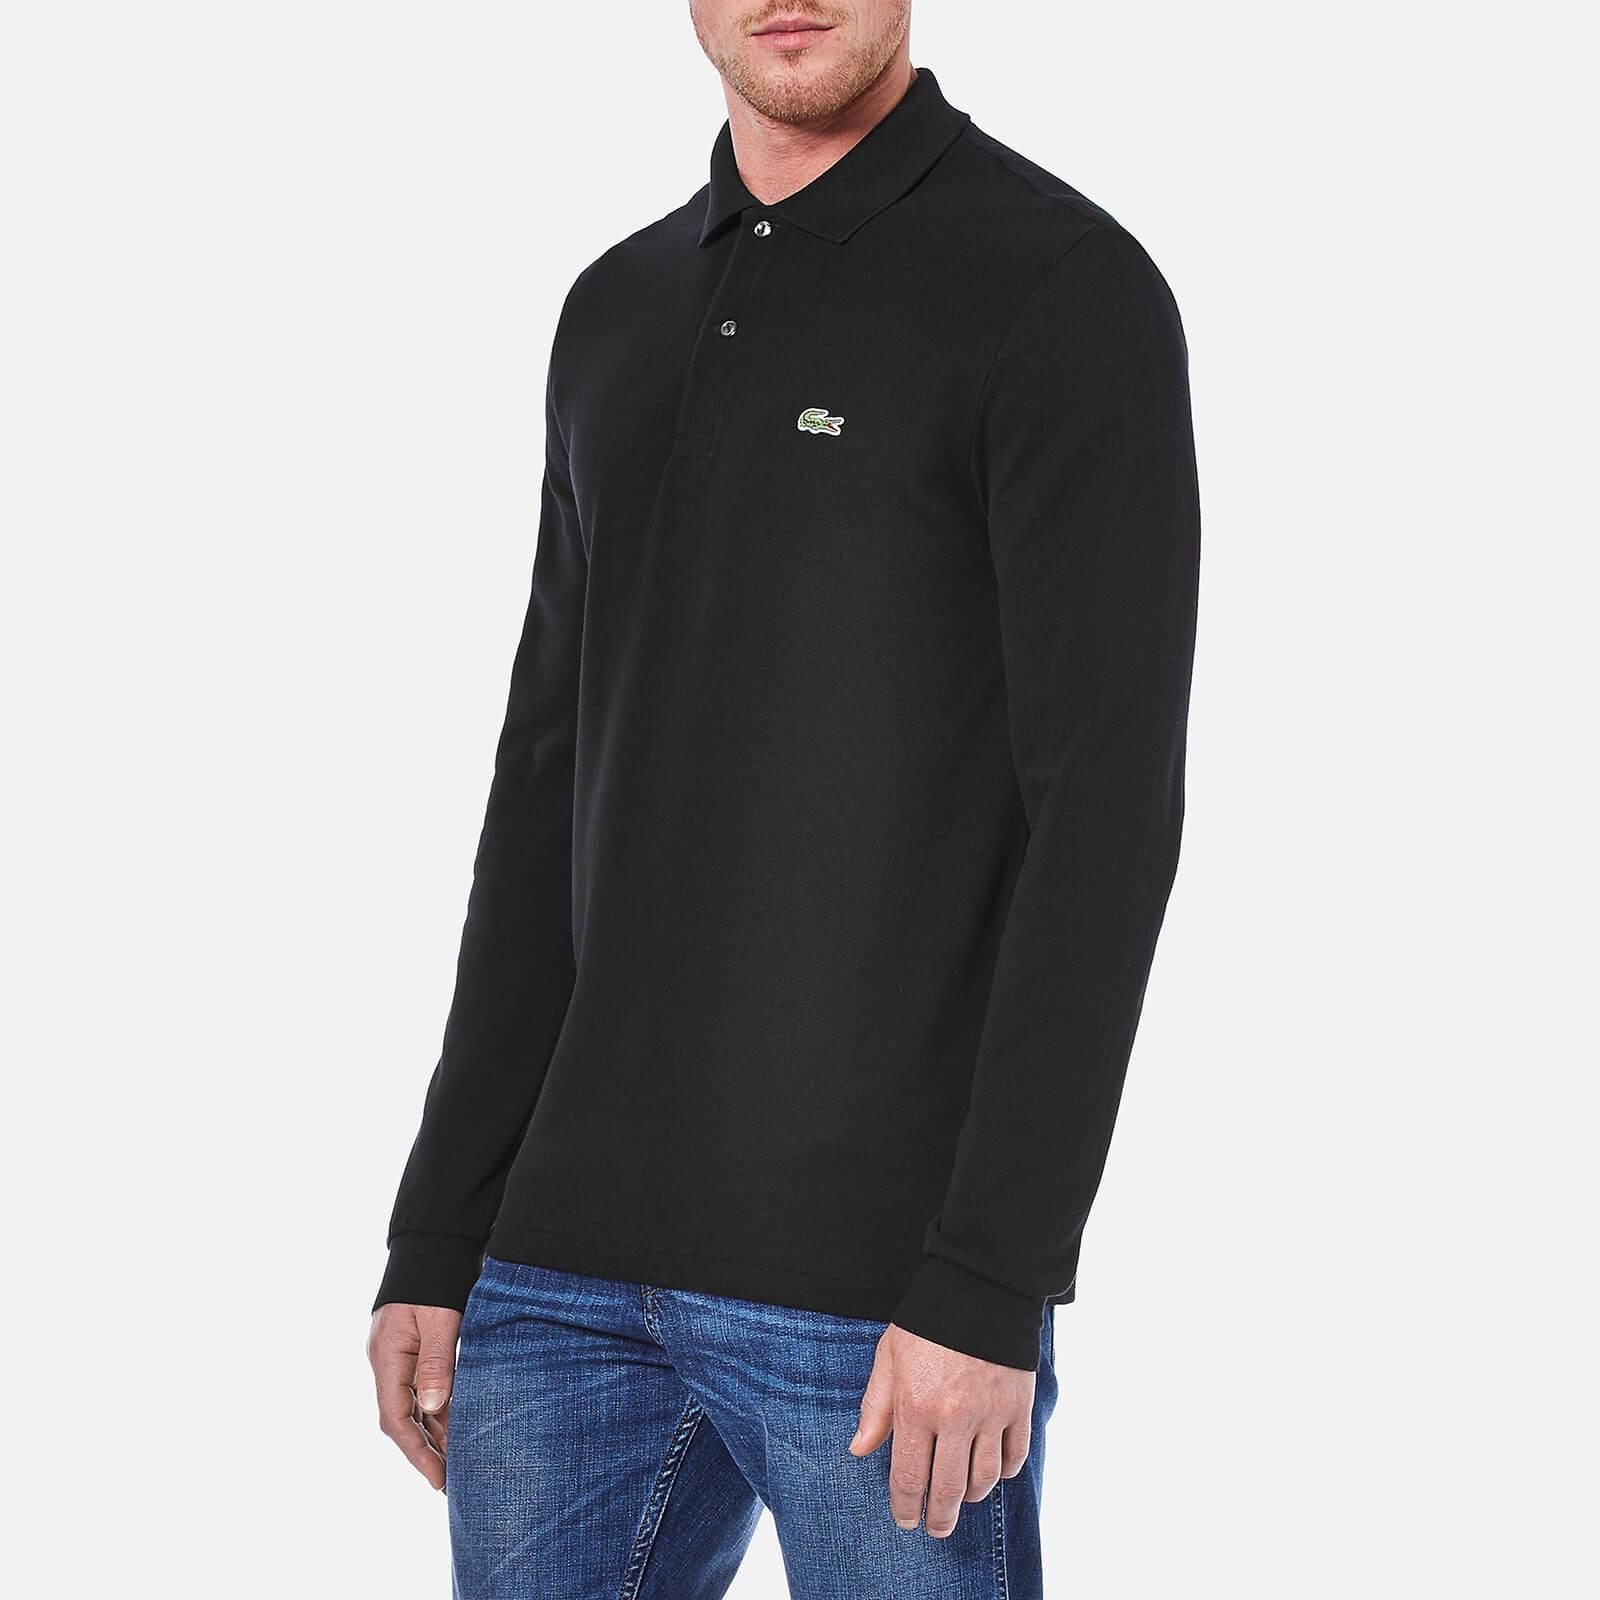 57c9fbe5b69f Lacoste - Black Long Sleeve Polo Shirt for Men - Lyst. View fullscreen